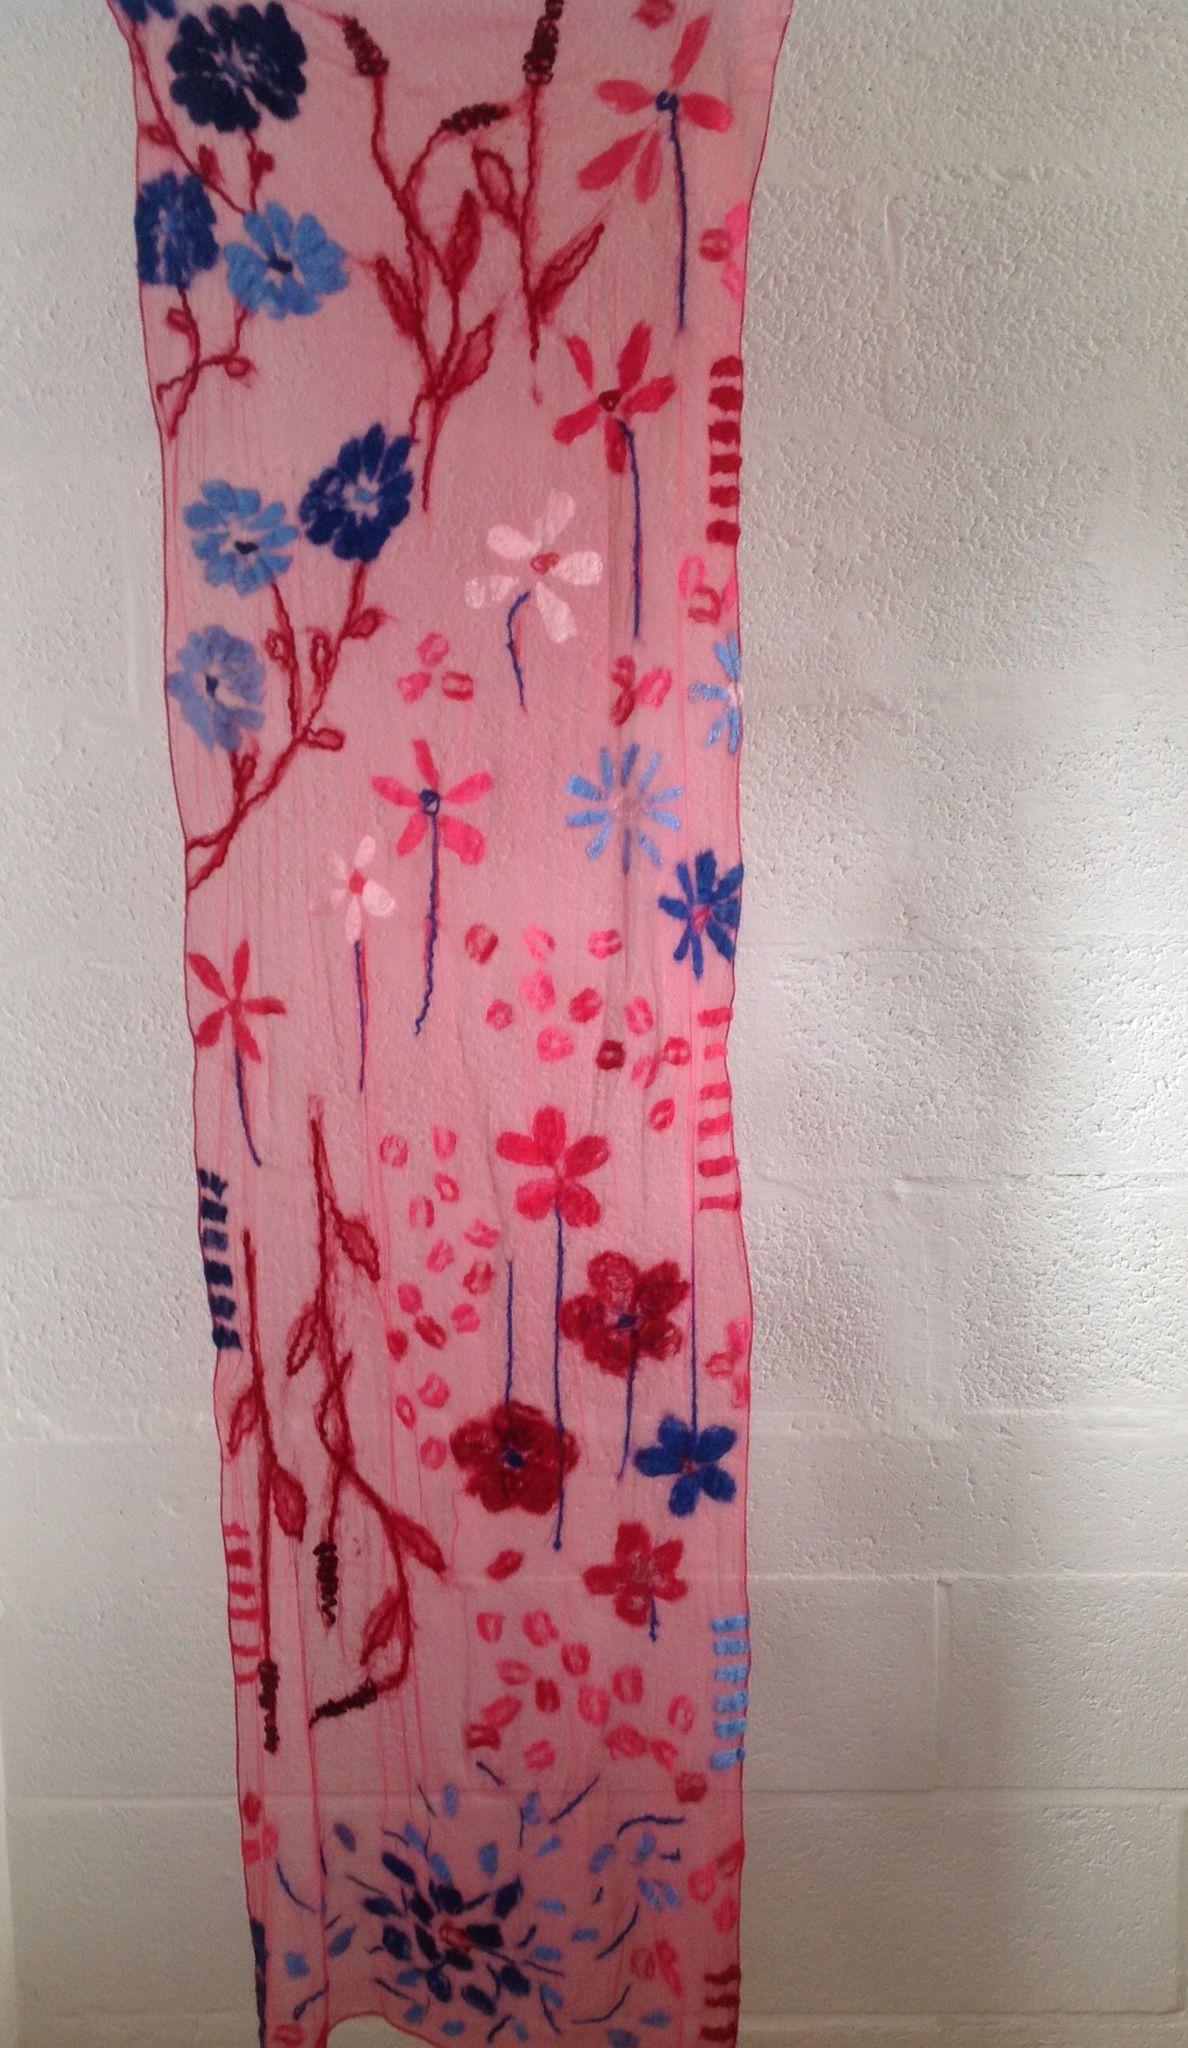 Nuno felted shawl by Veerlaine. Merino design on silk chiffon